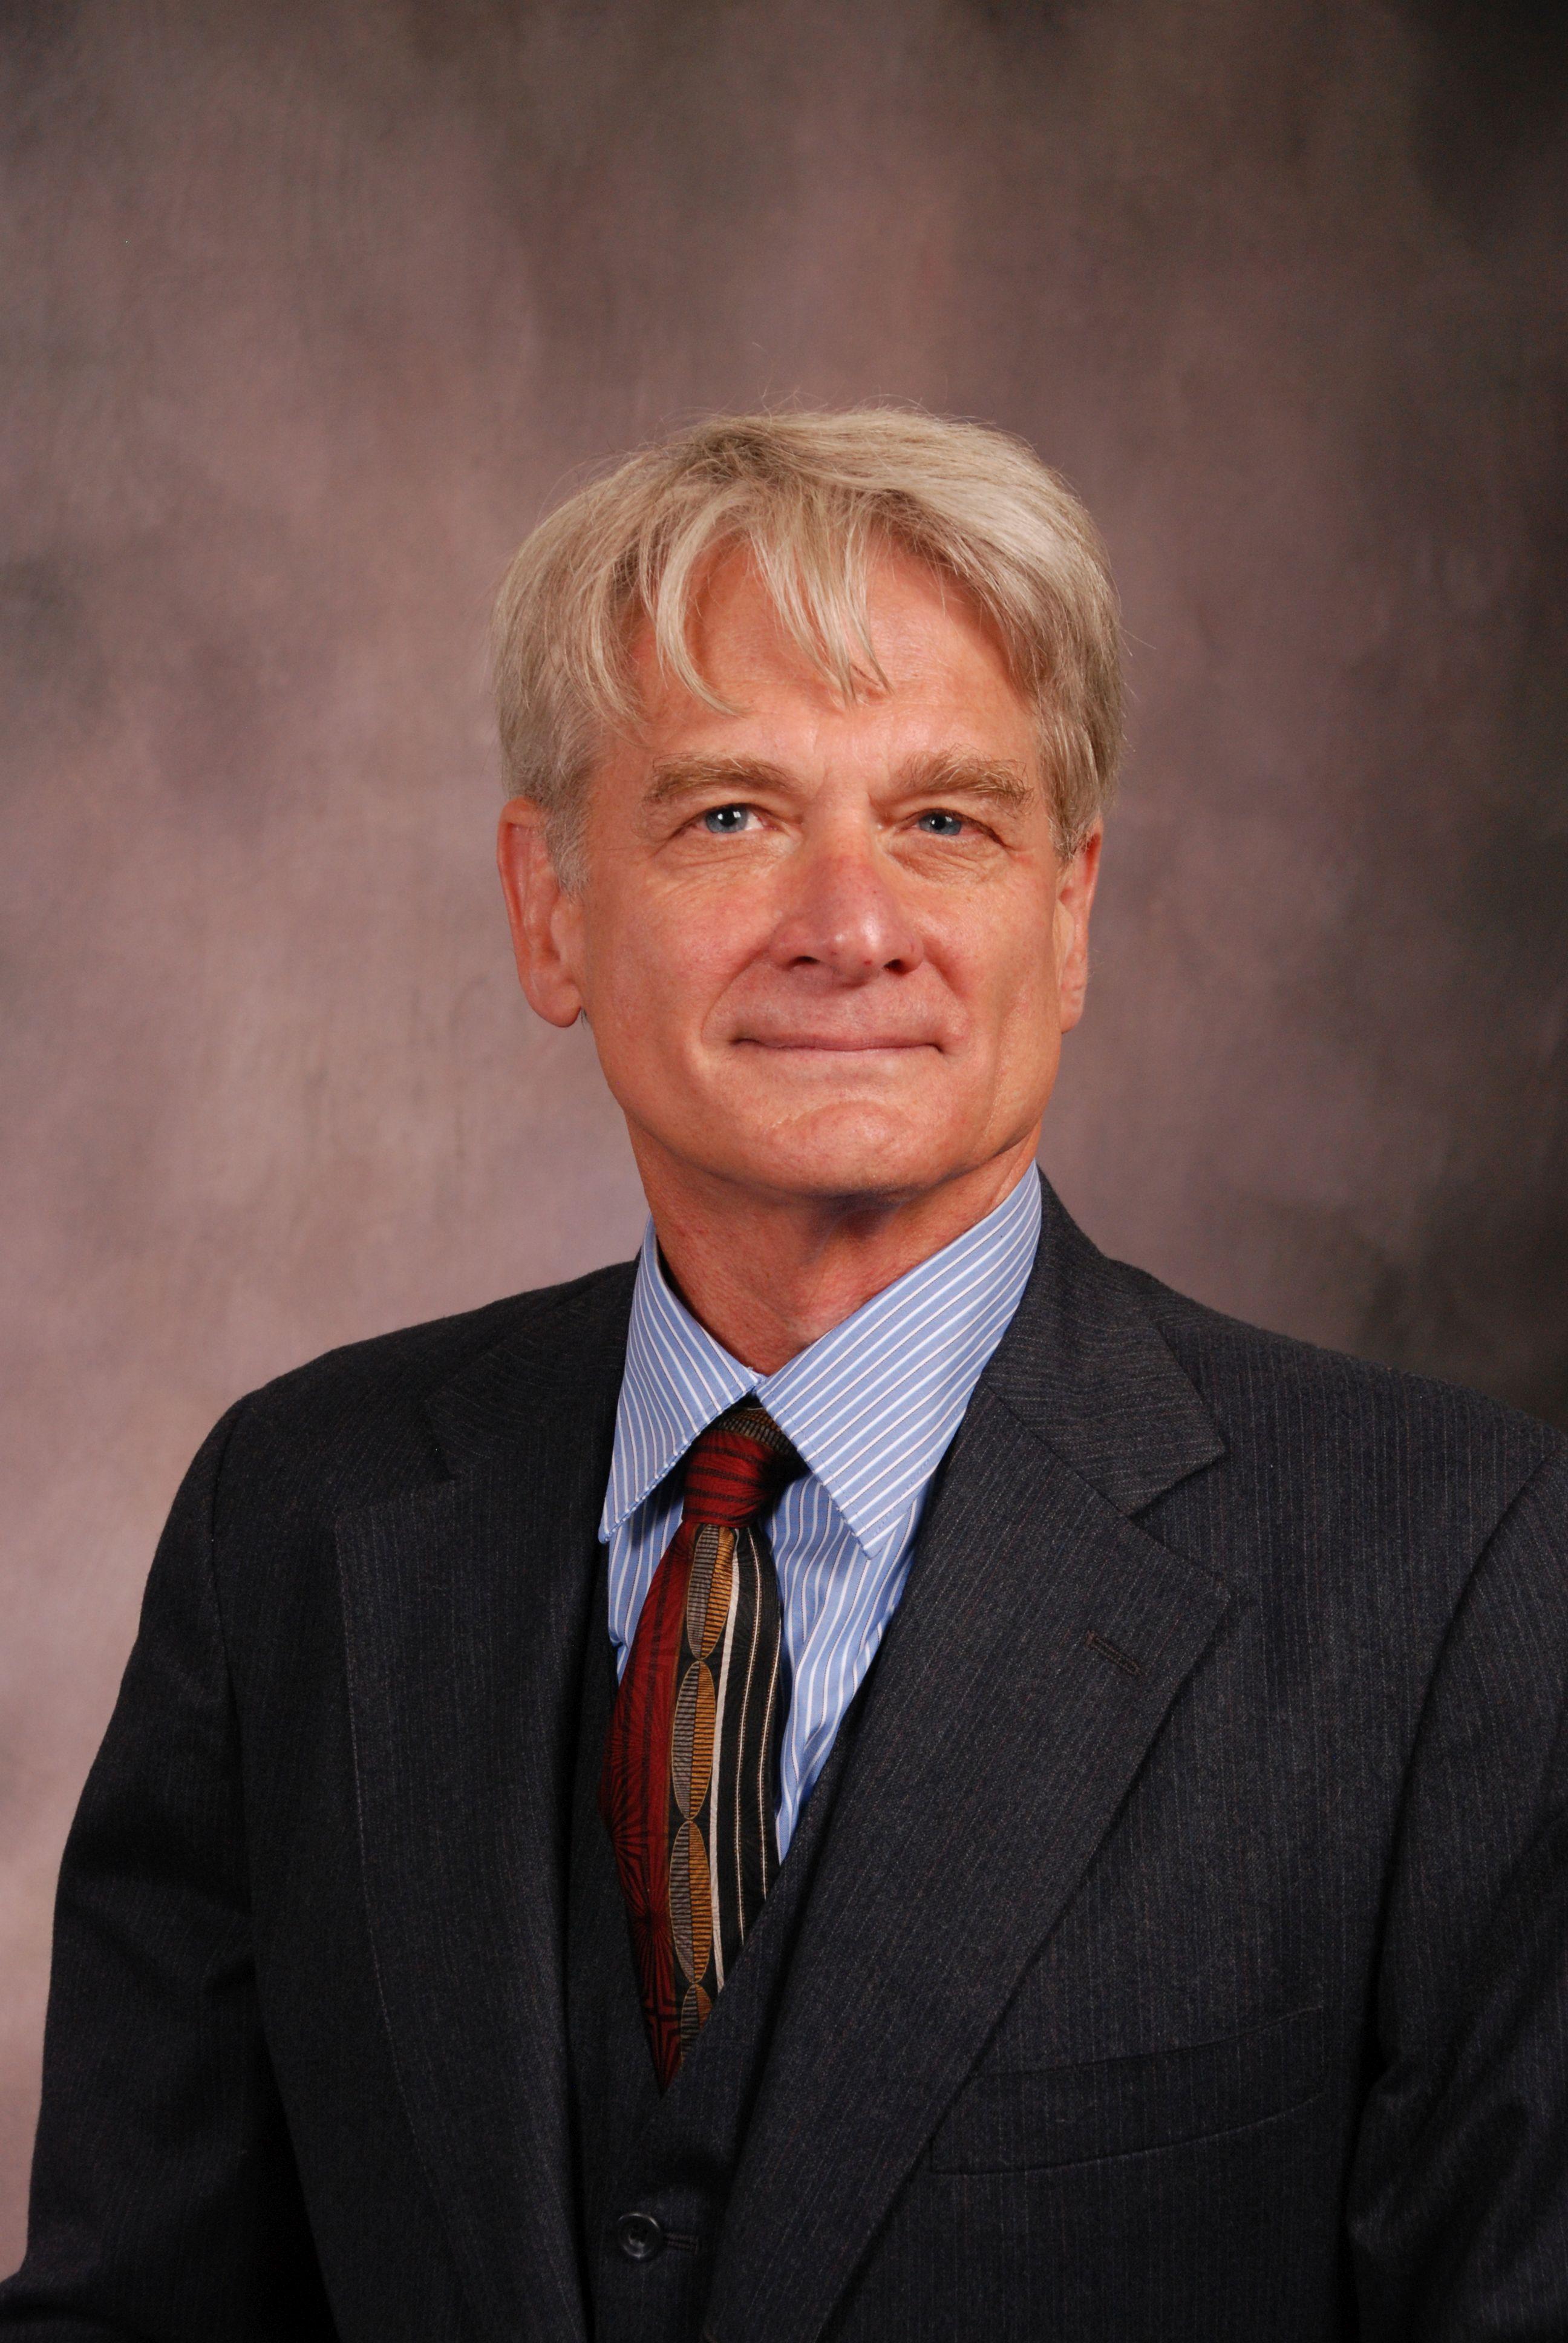 dr gerard adams doctor of plant health university of nebraska dr gerard adams